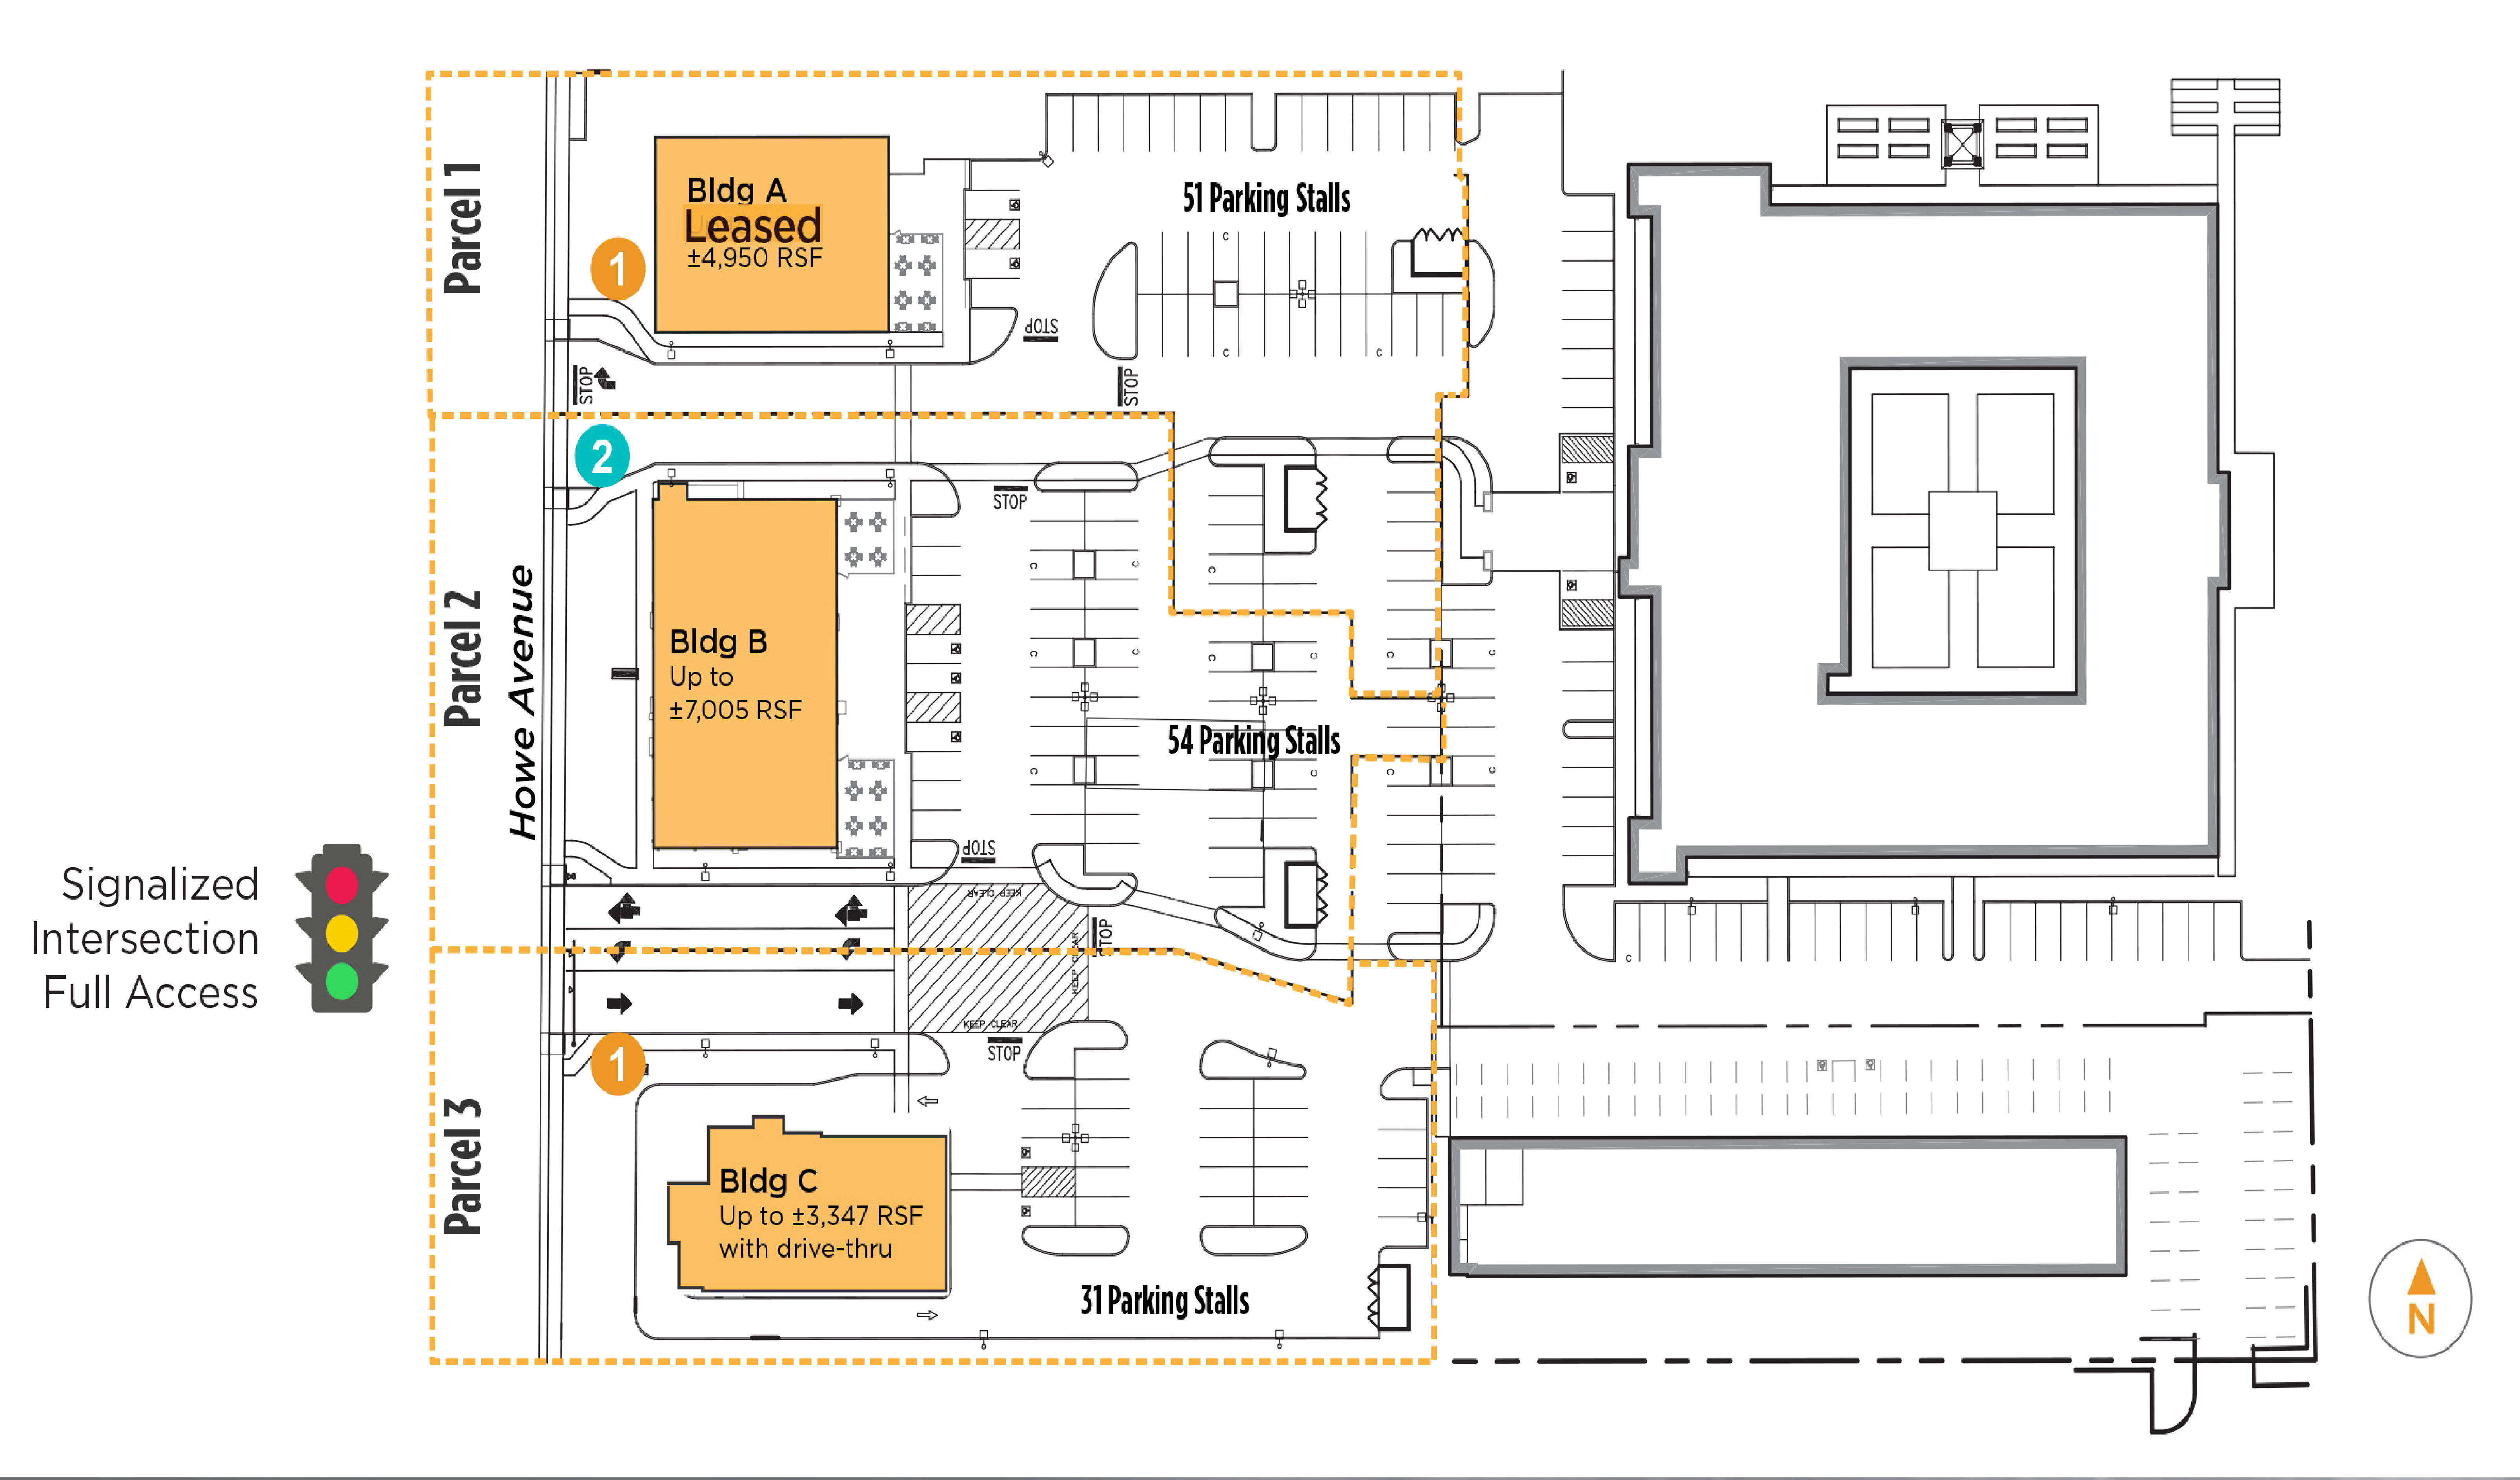 1420 Howe Avenue: site plan